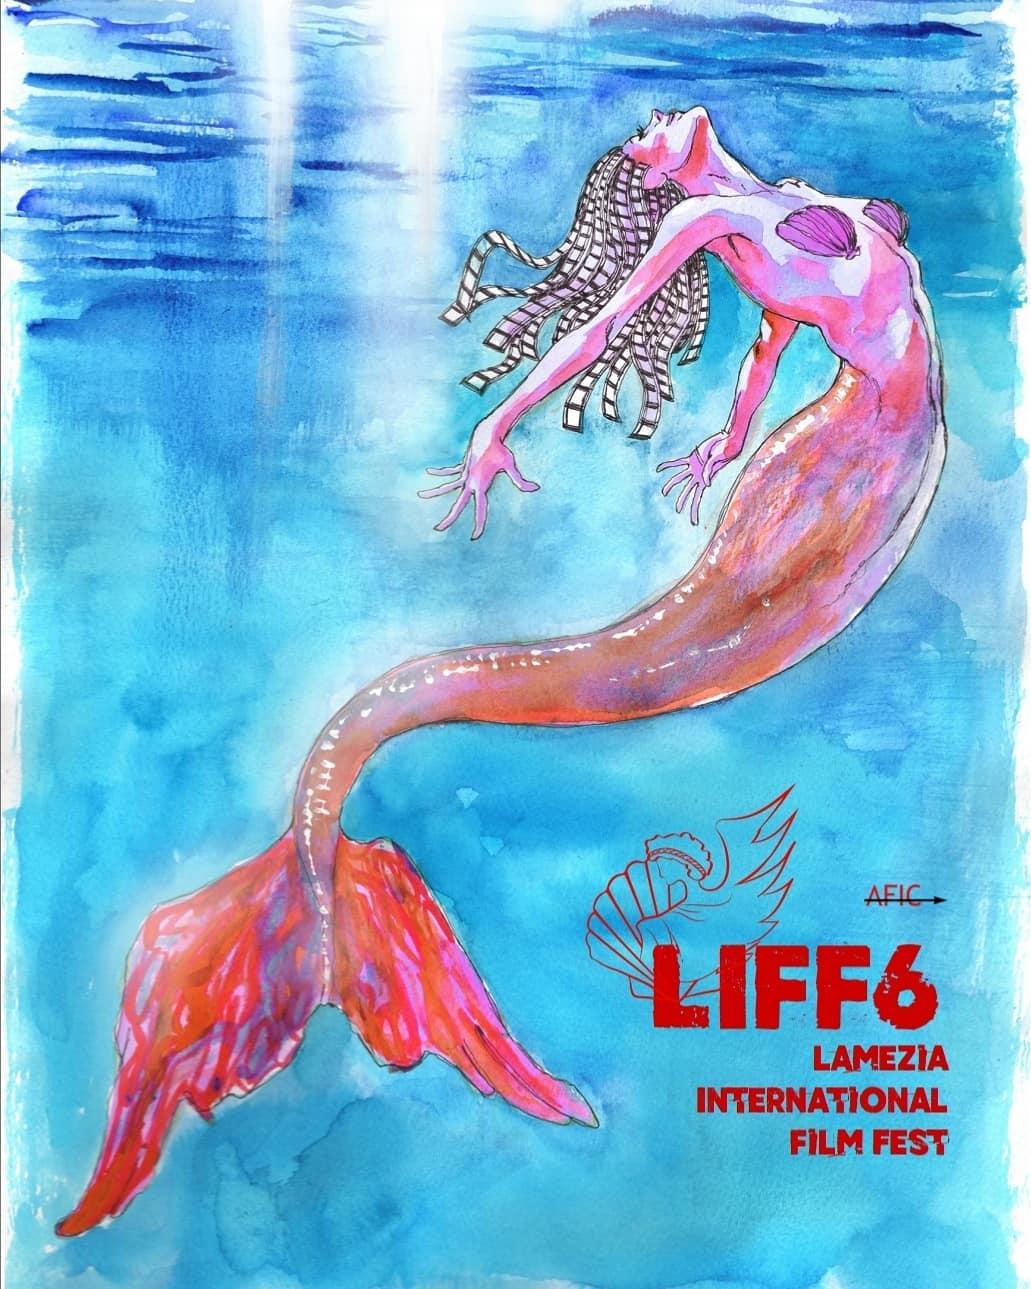 Lamezia International Film Fest